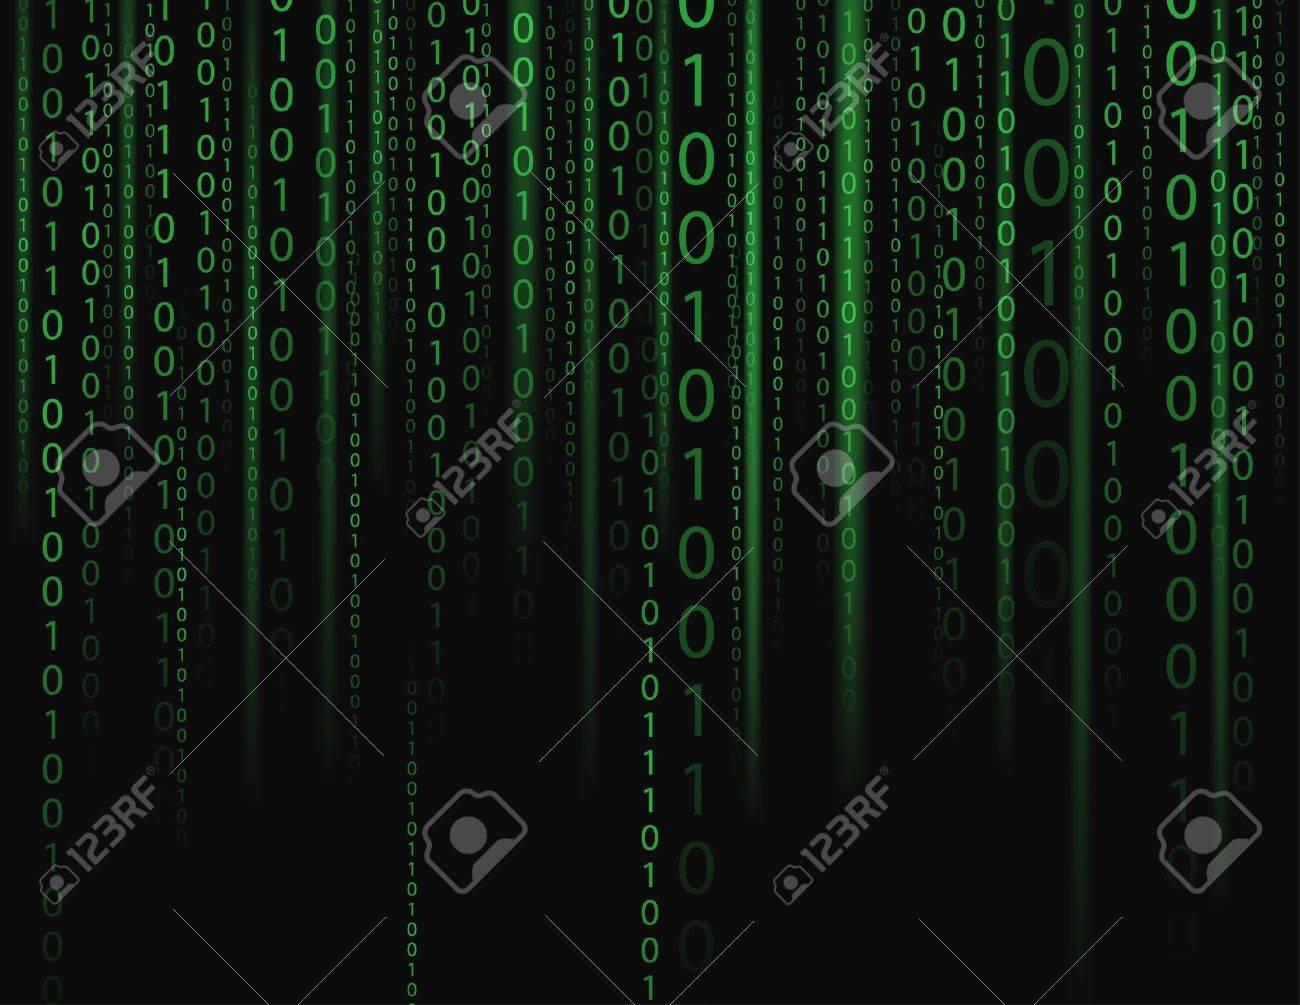 Stream on binary codes on black background - 14608934